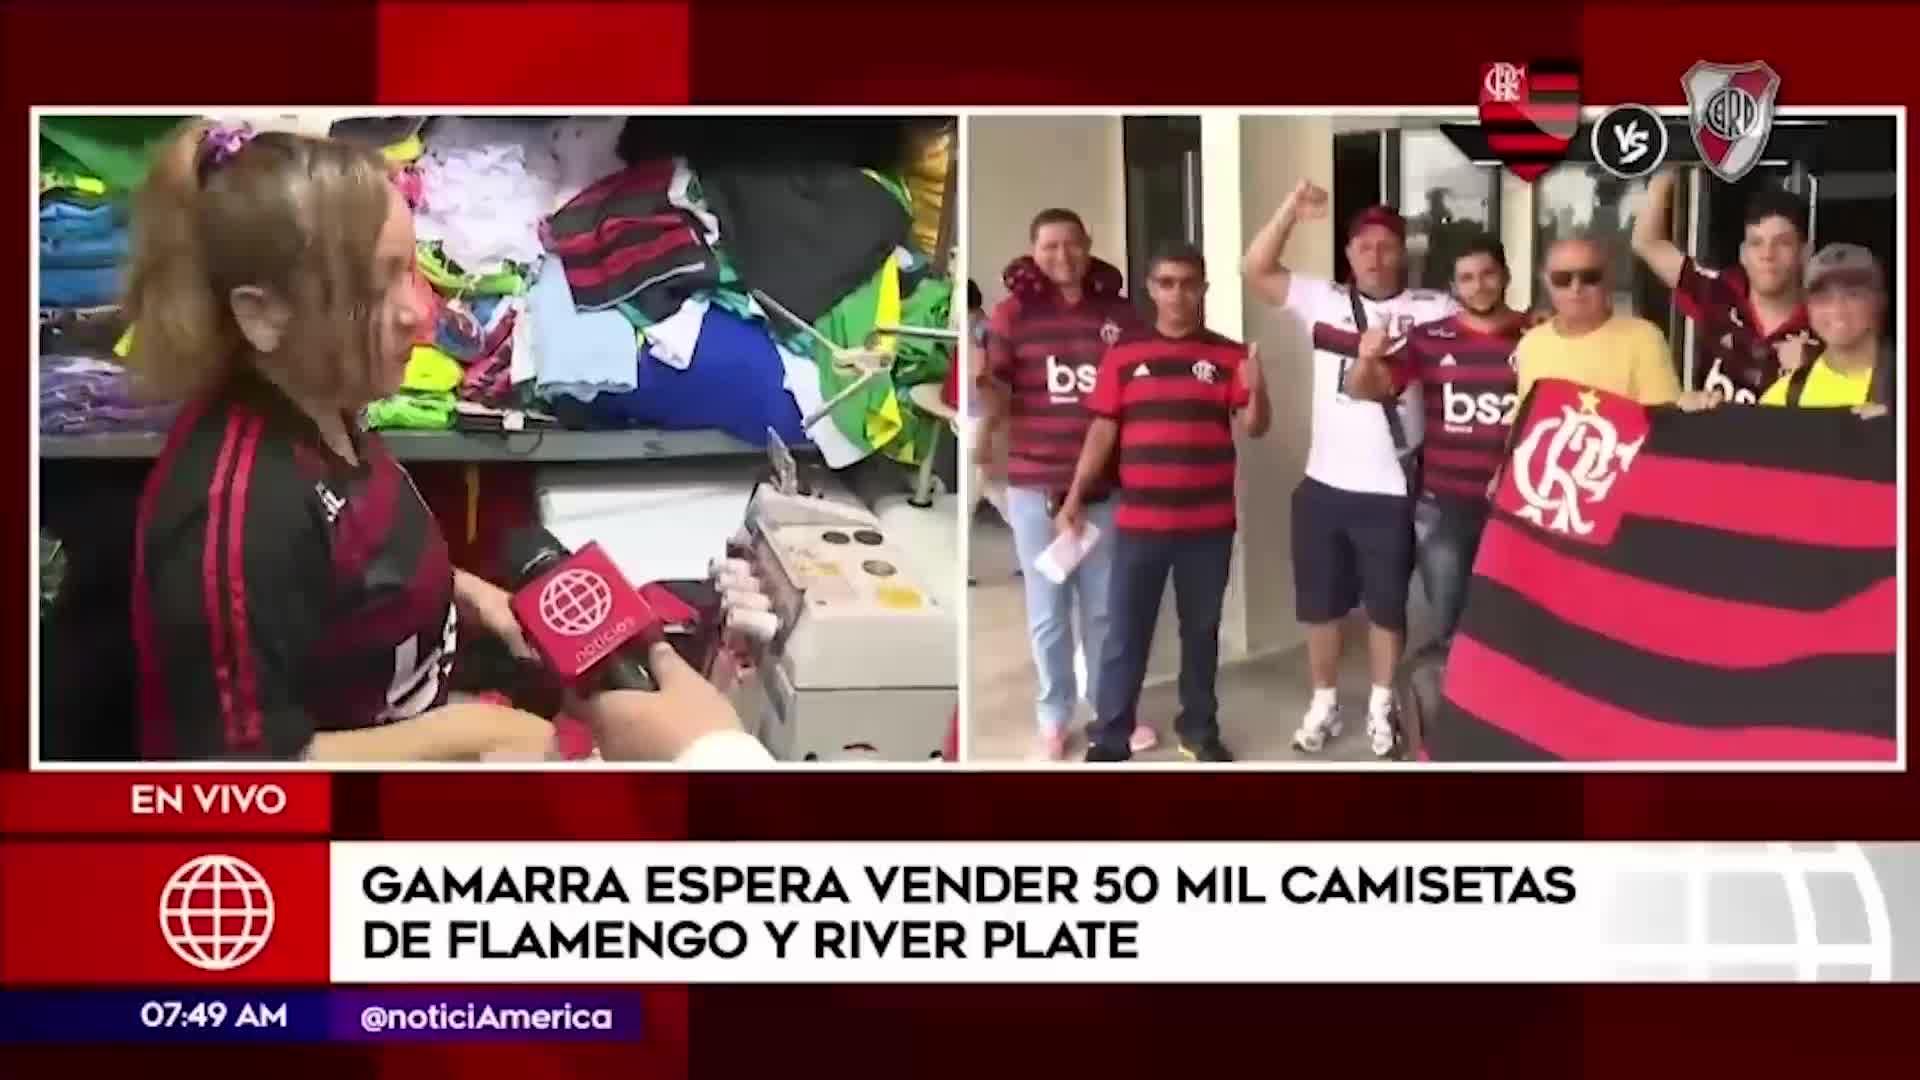 Copa Libertadores 2019: Gamarra espera vender 50 mil camisetas de River y Flamengo